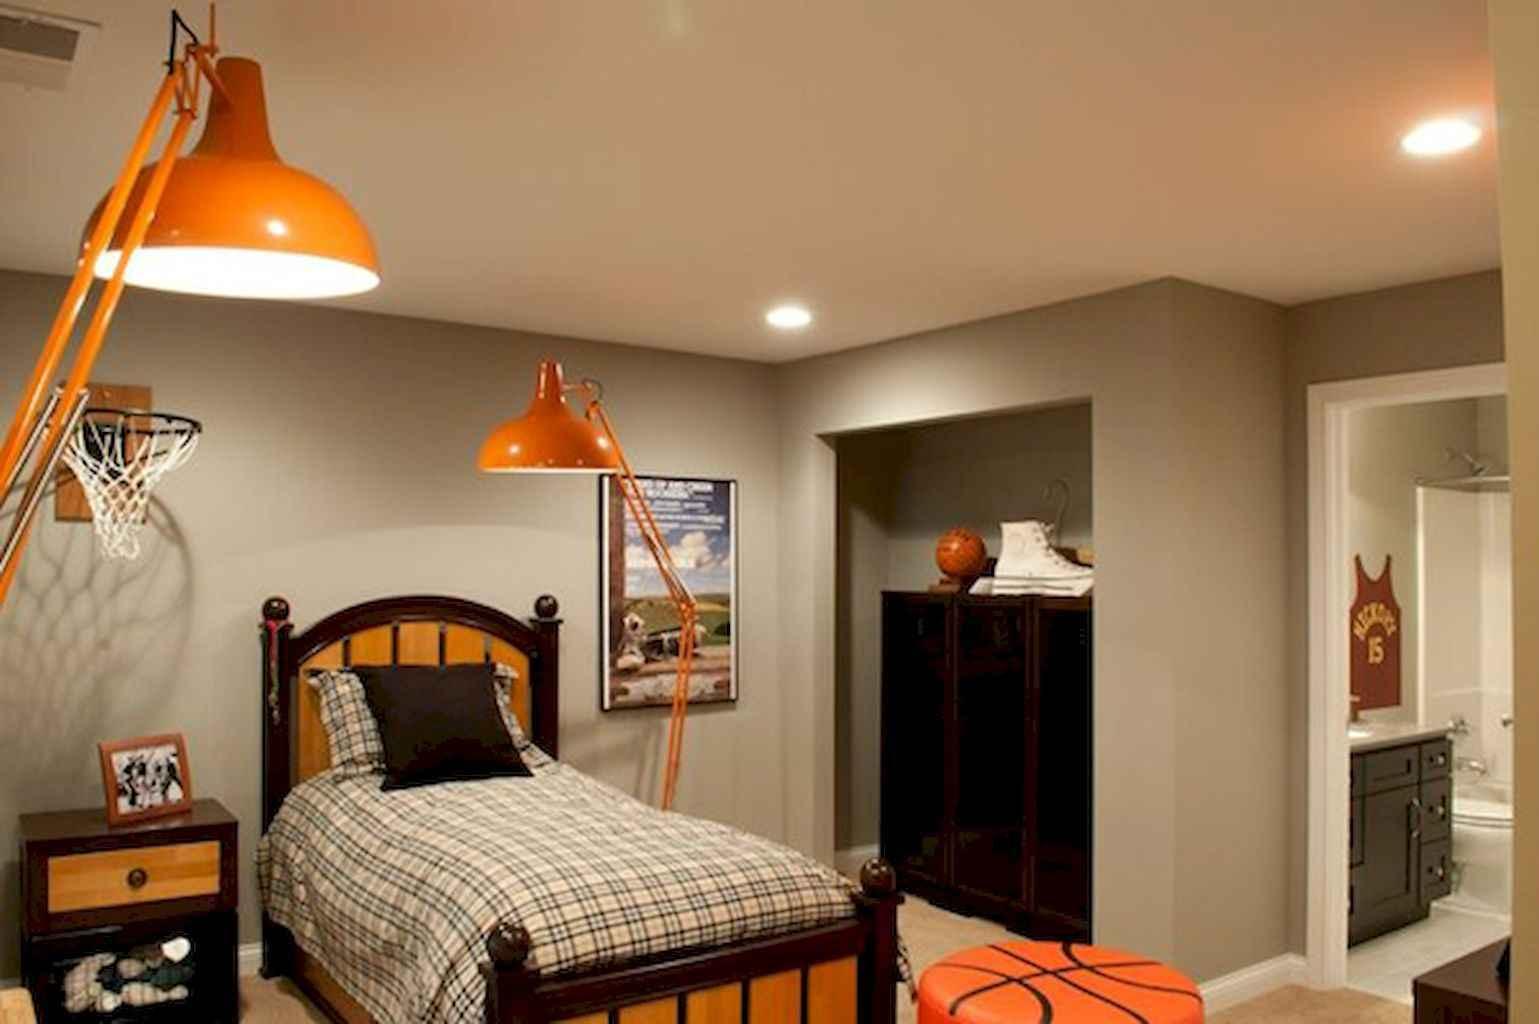 50 Sport Bedroom Design Ideas Remodel for Boys - LivingMarch.com